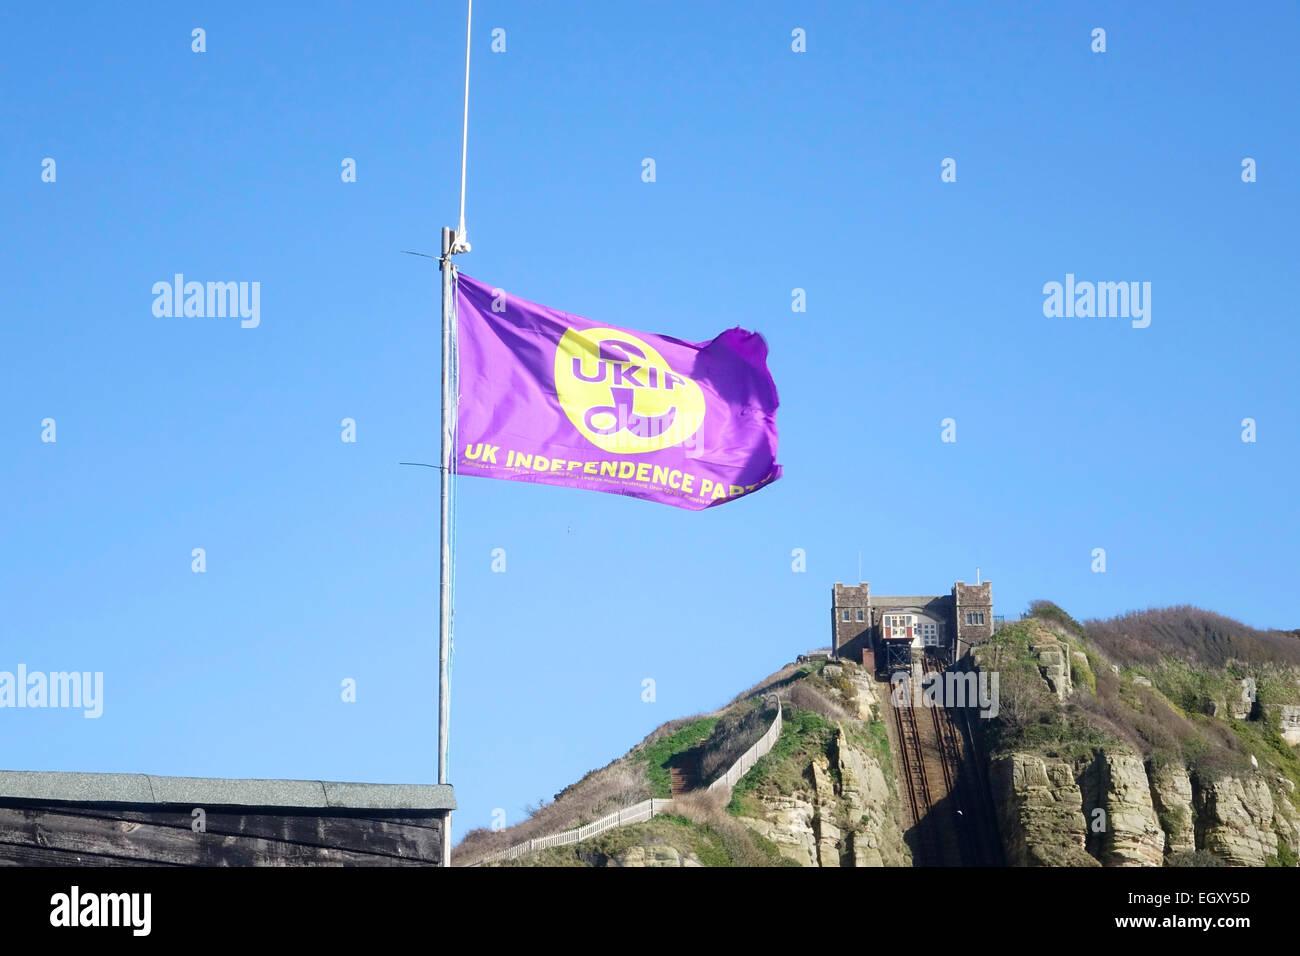 UKIP Flag flying on Hastings Stade fishermen's beach, East Sussex, GB - Stock Image